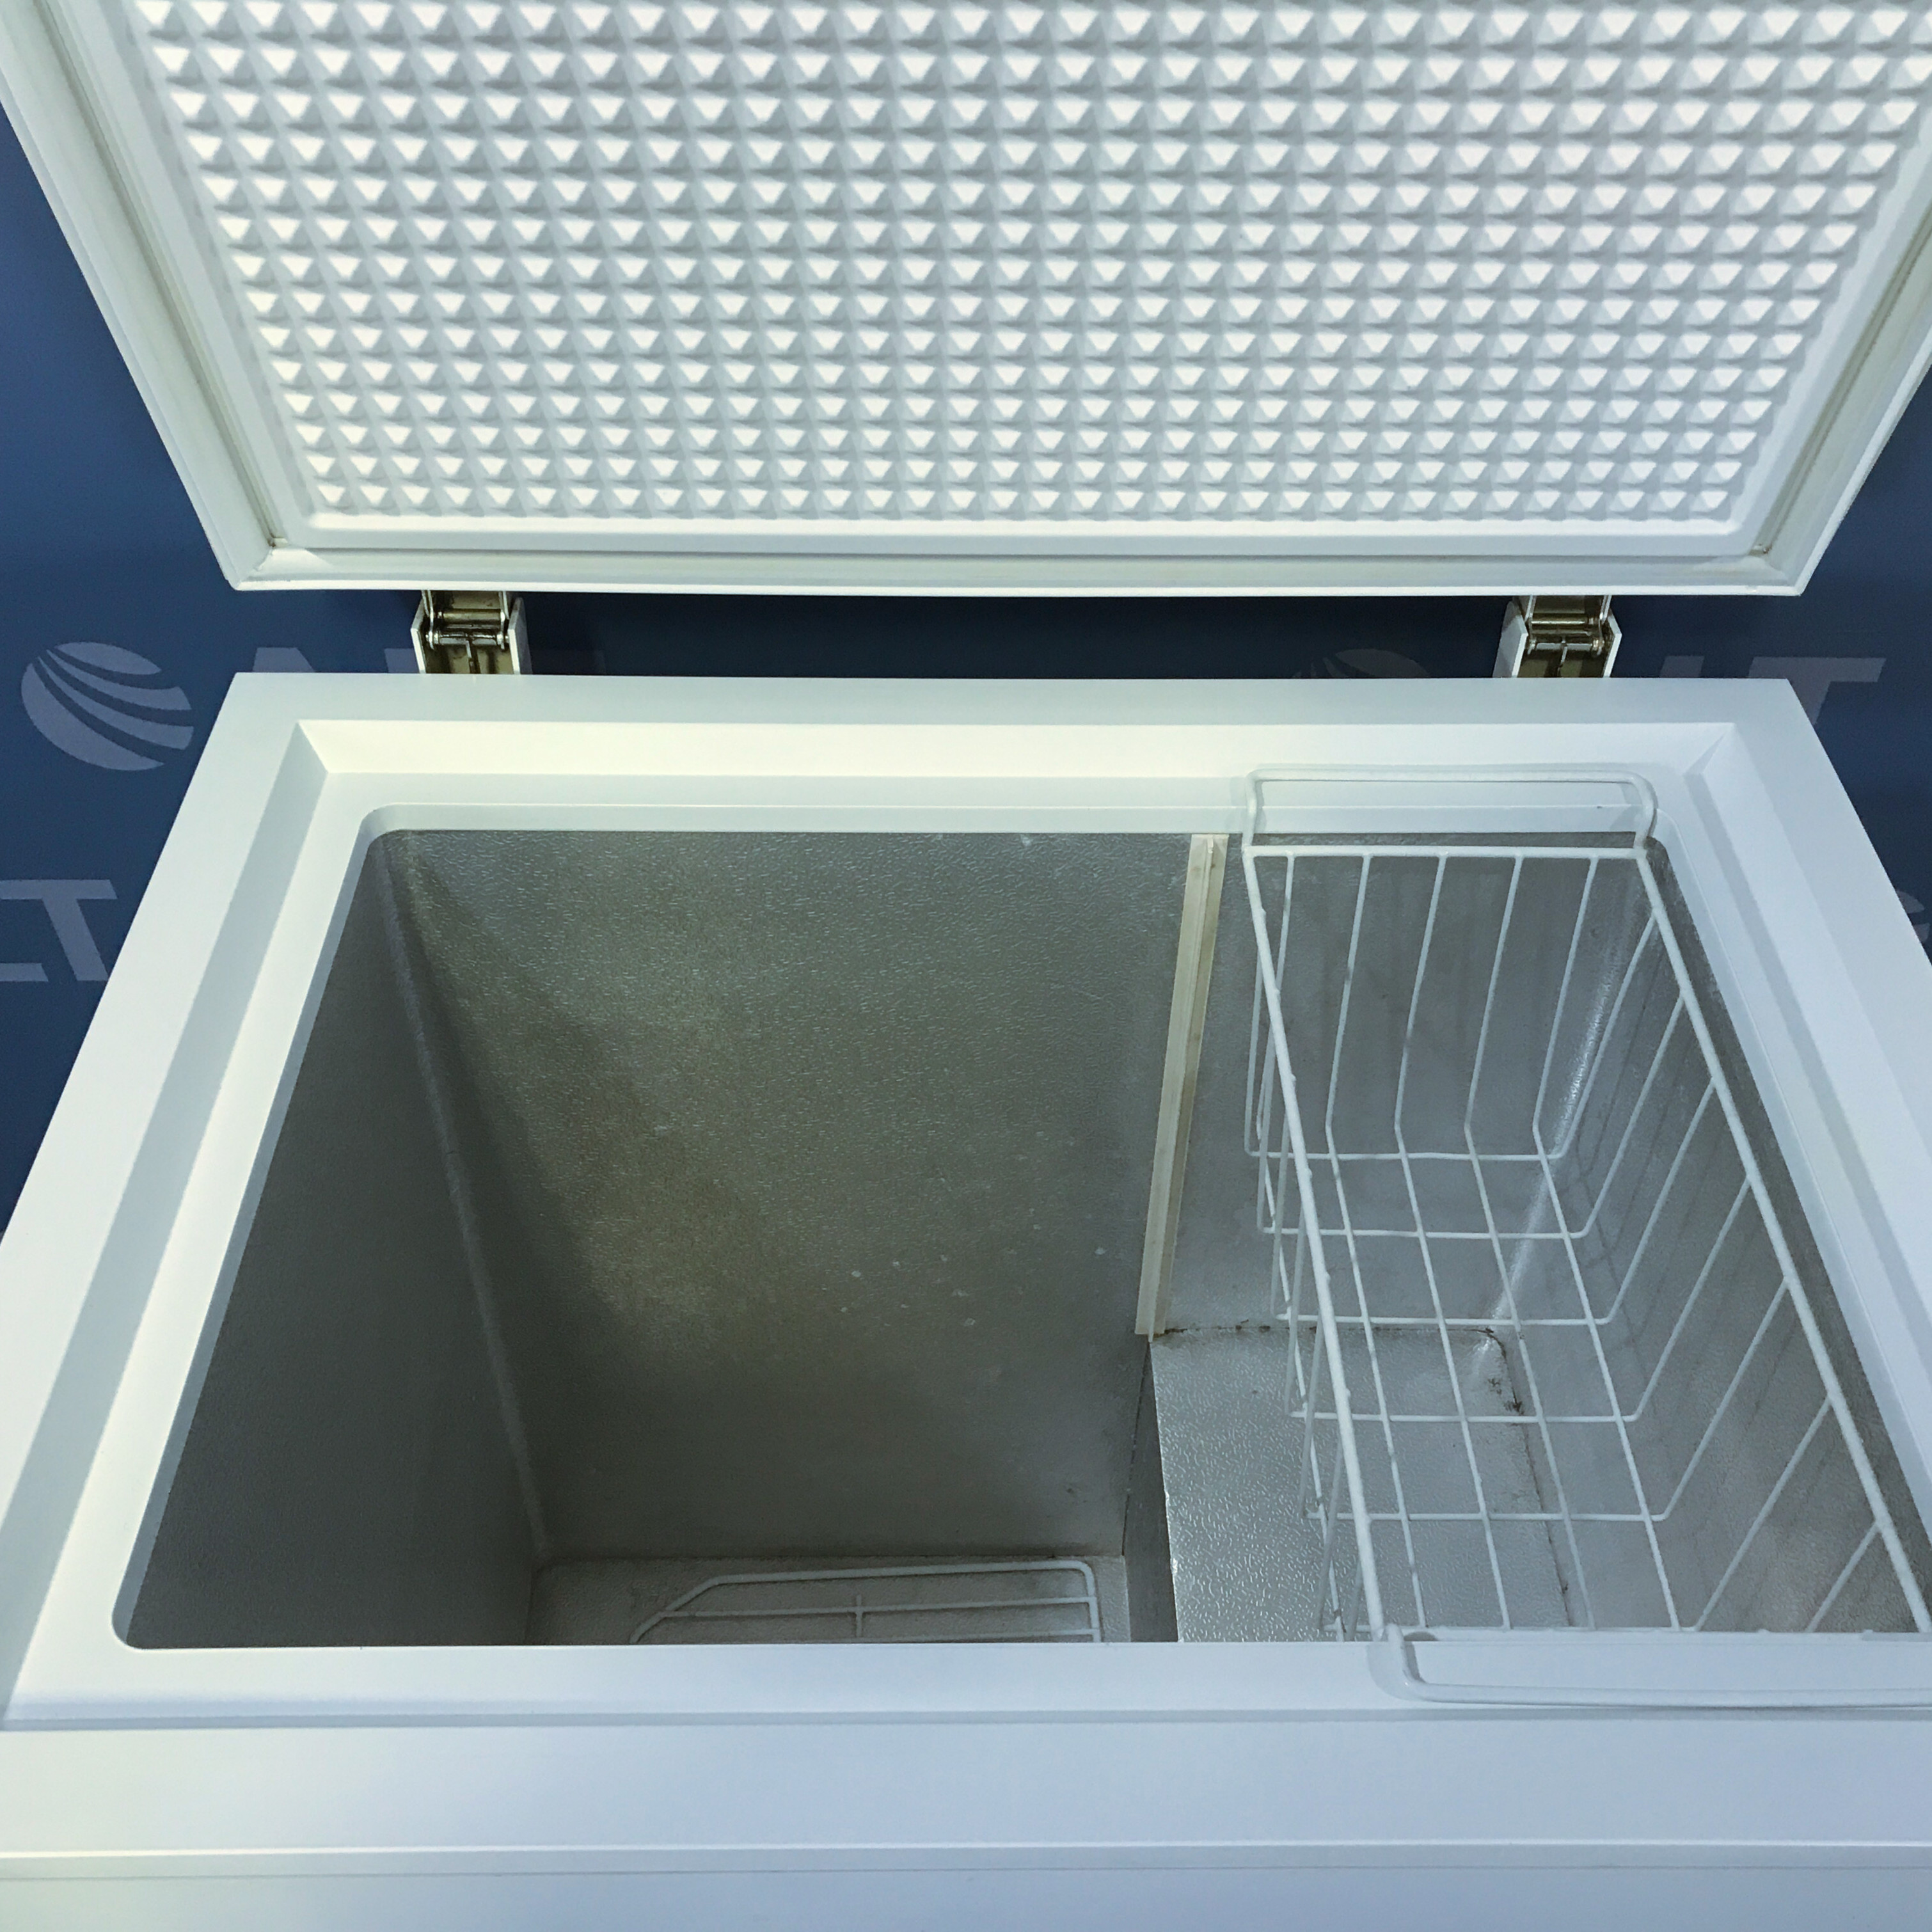 GE 5.0 Cu. Ft. Manual Defrost Chest Freezer Model FCM5DRBWH Image